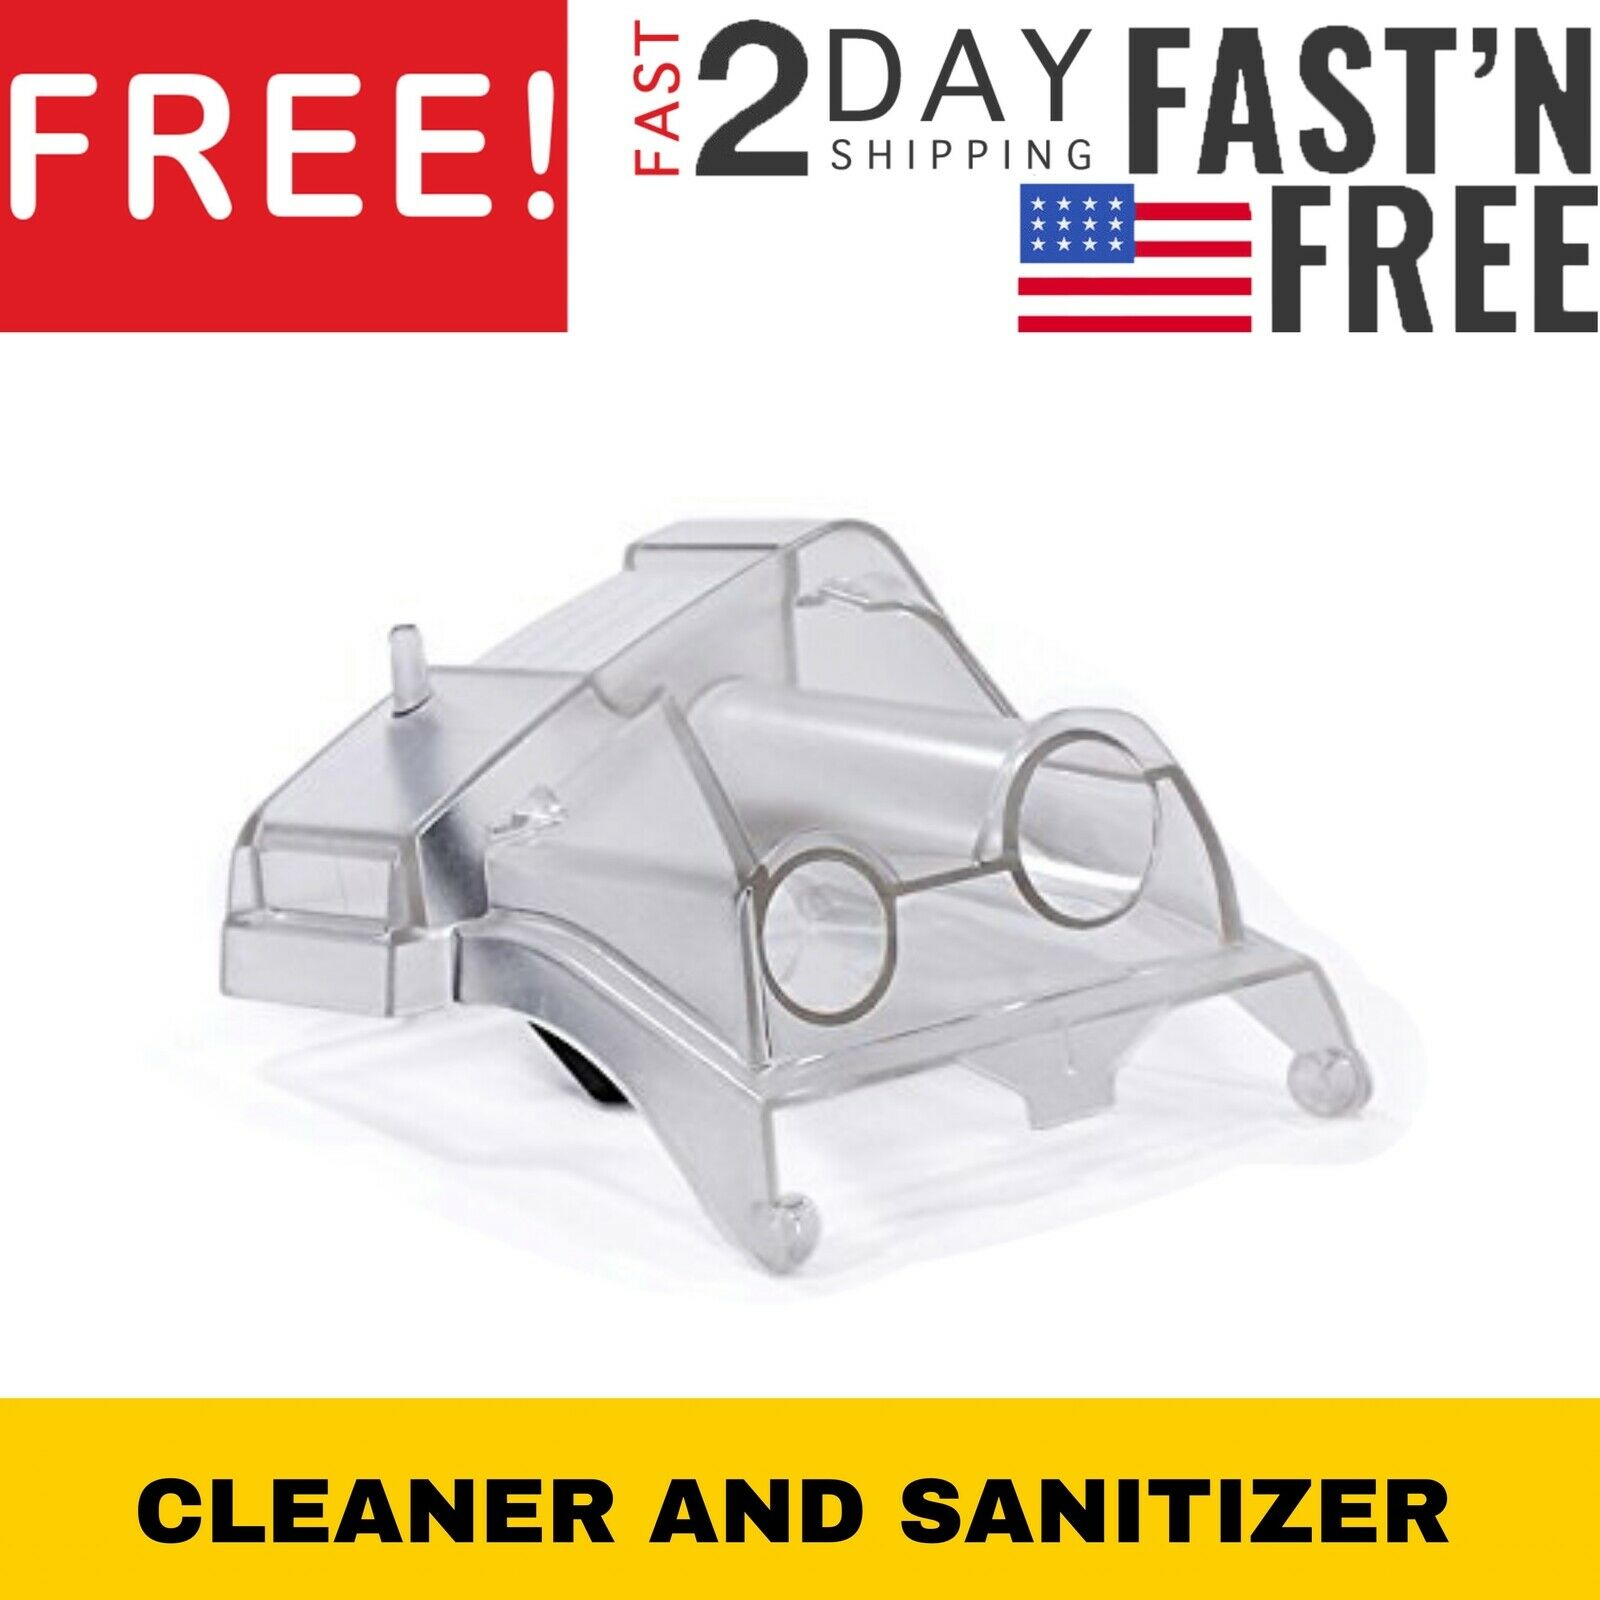 CPAPCleanerAndSanitizer Adapter For Resmed AirSense 10